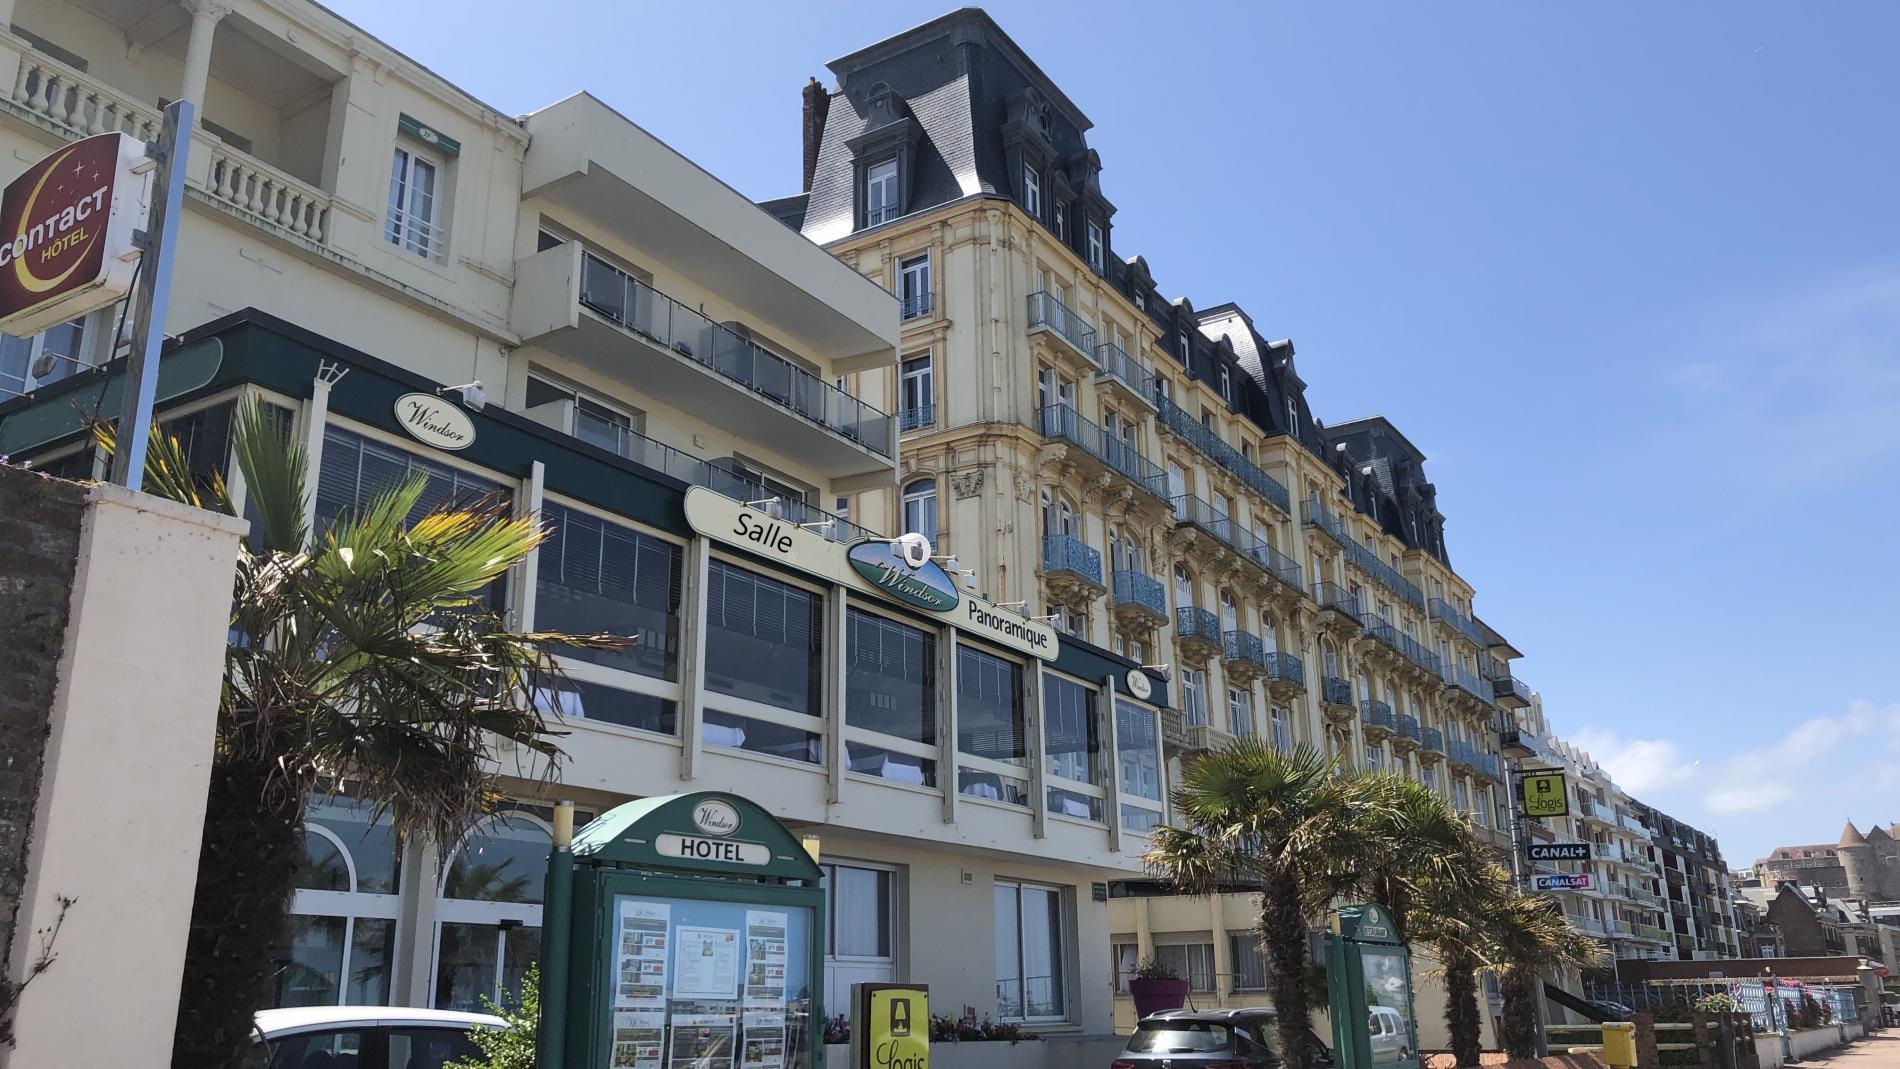 Hotel Windsor - Hotel en Normandie